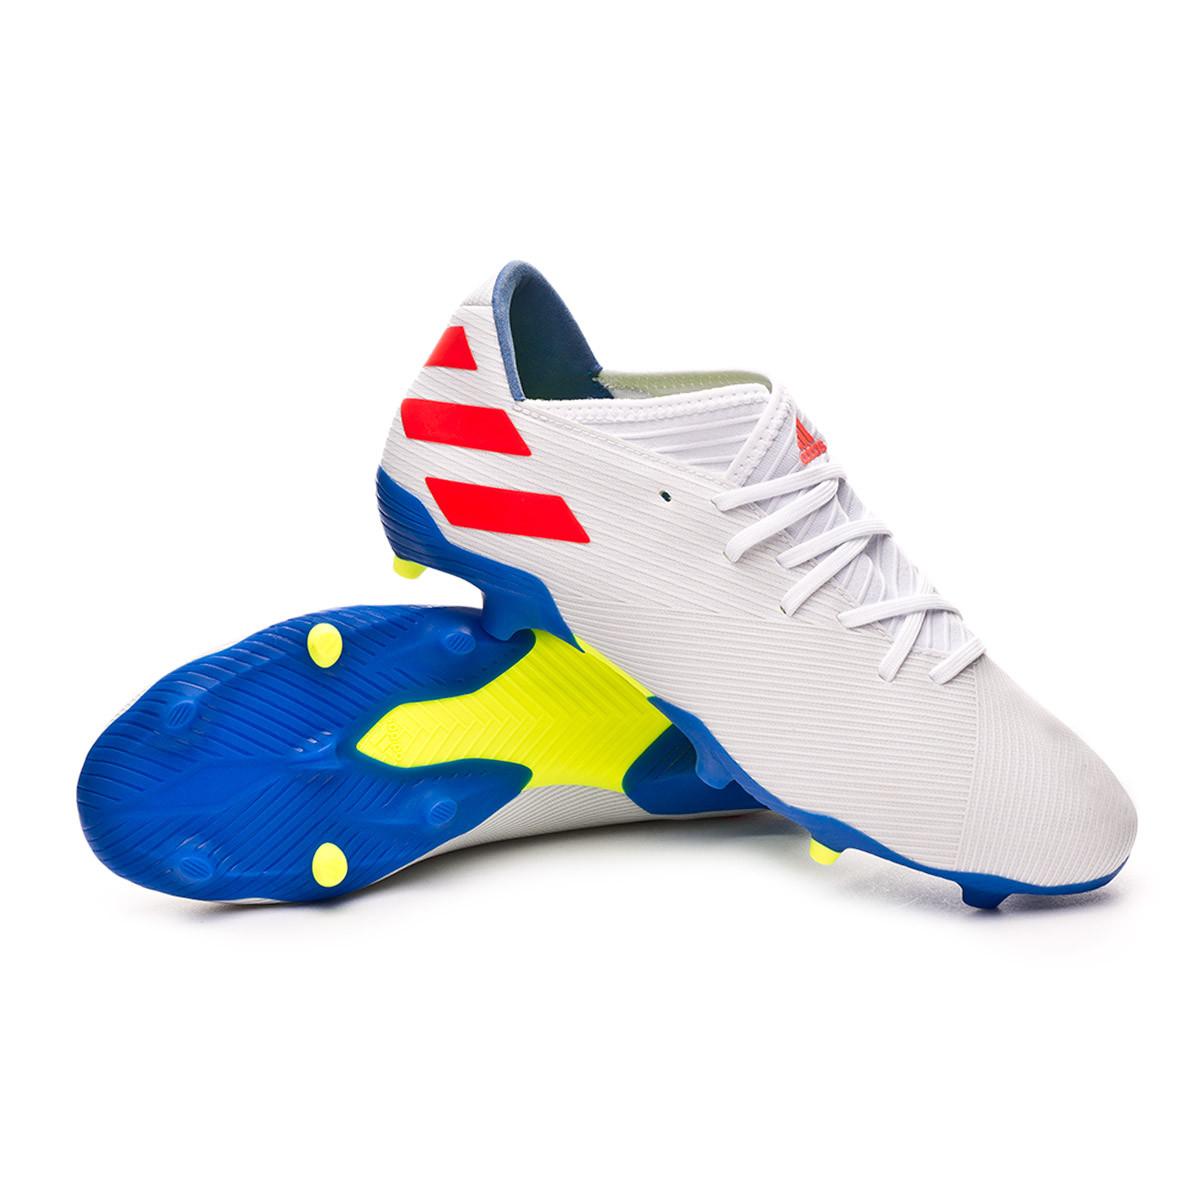 bbc5ecc3c34cac Scarpe adidas Nemeziz Messi 19.3 FG White-Solar red-Football blue - Negozio  di calcio Fútbol Emotion